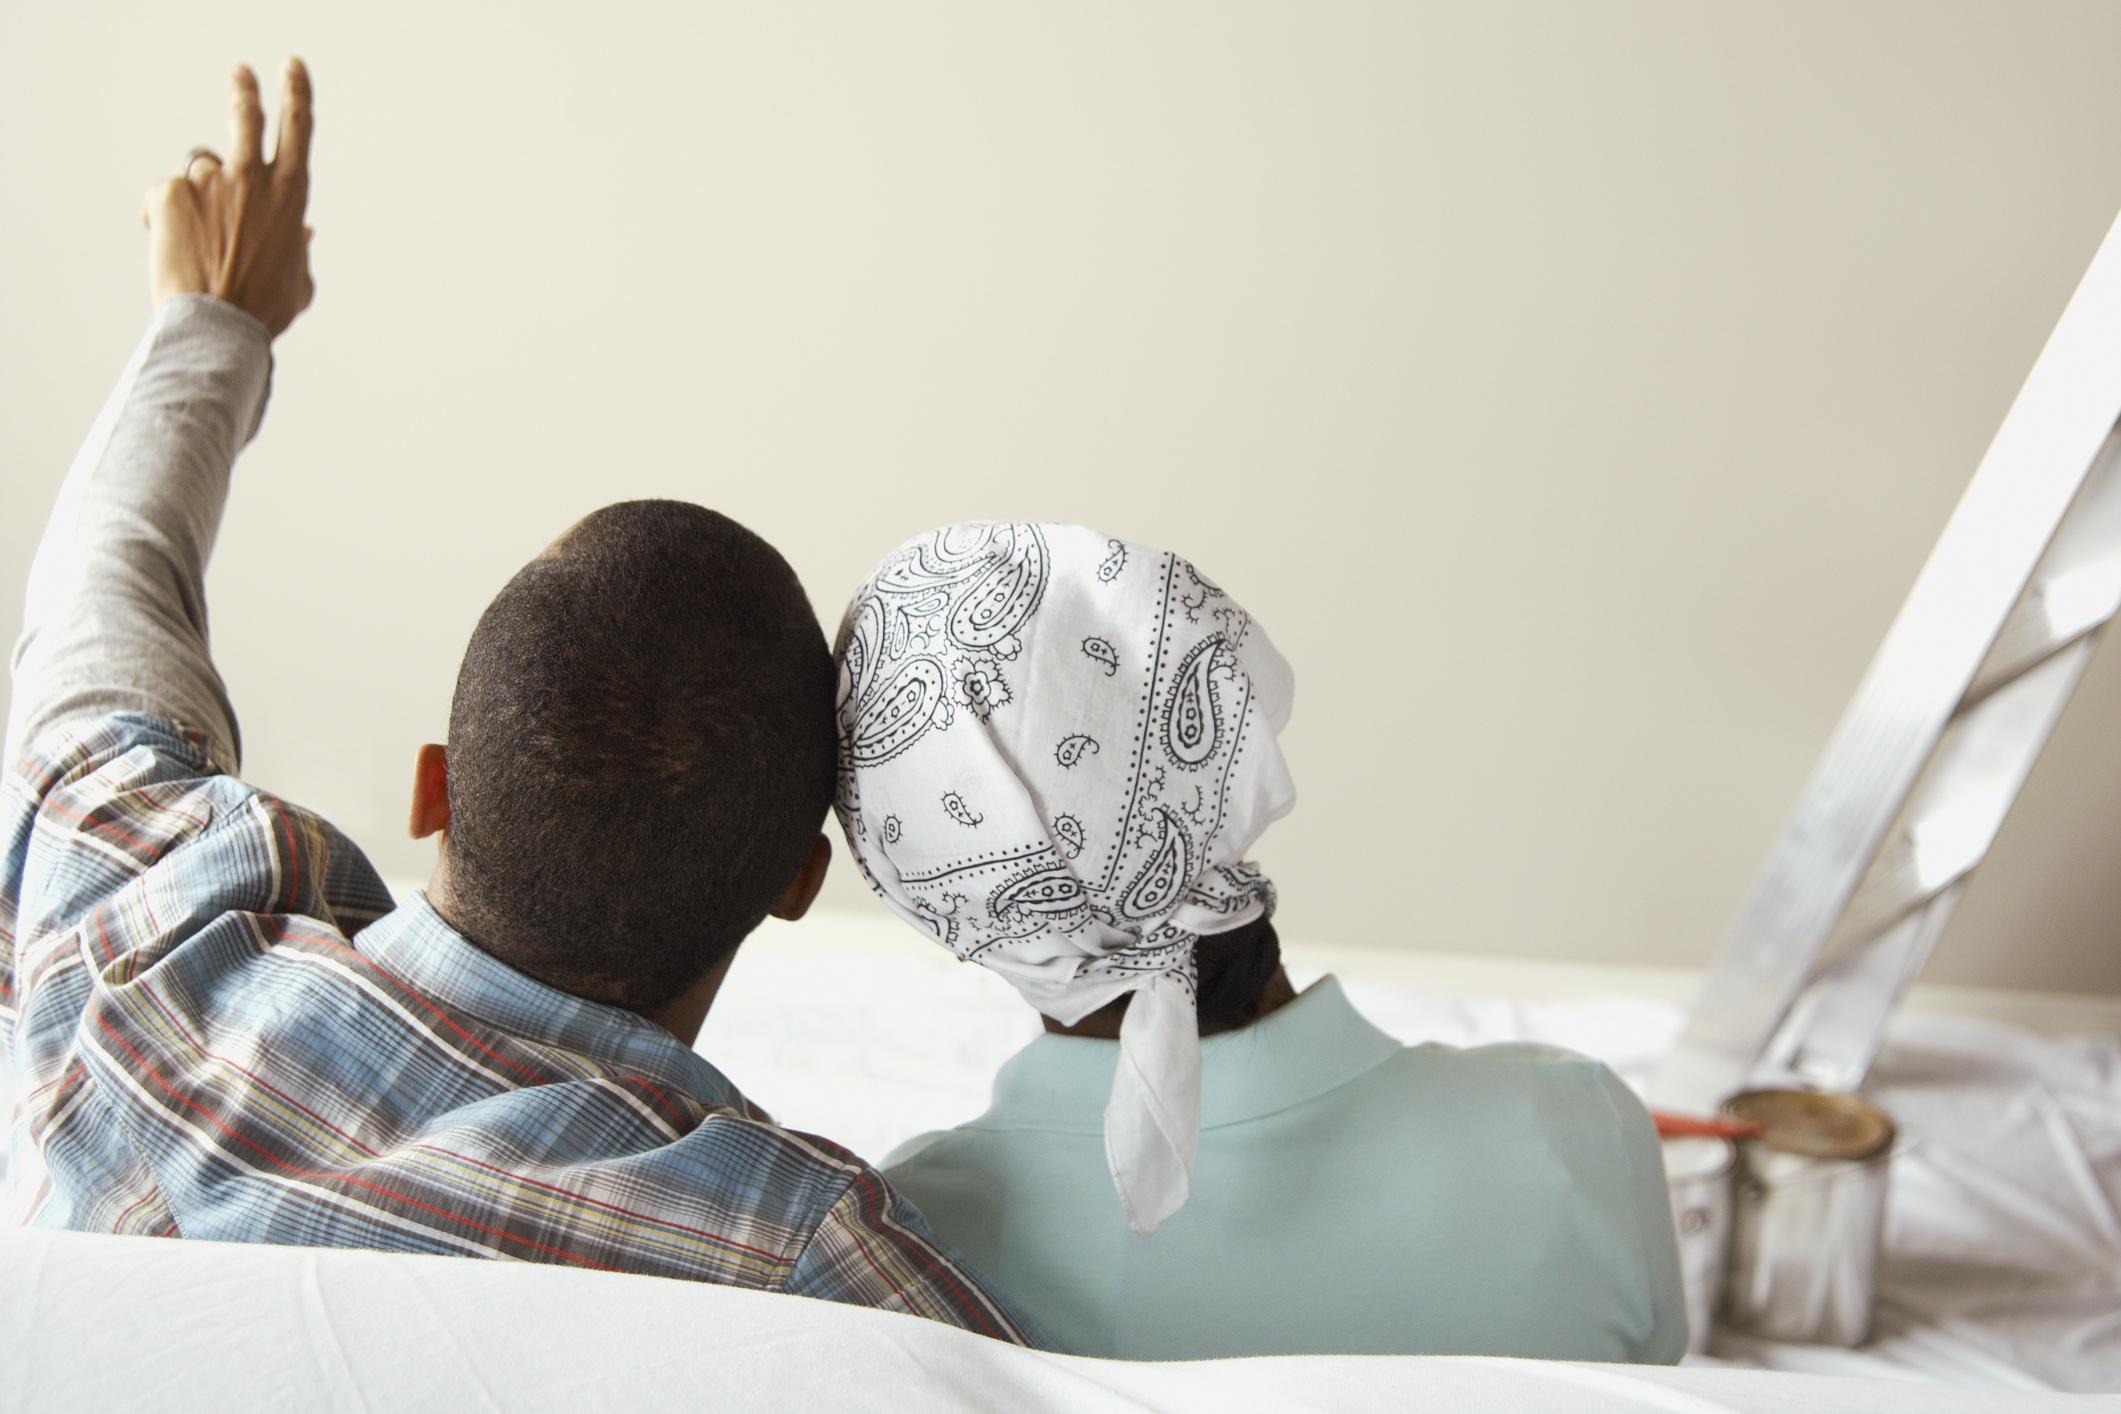 Couple visualizing home renovations